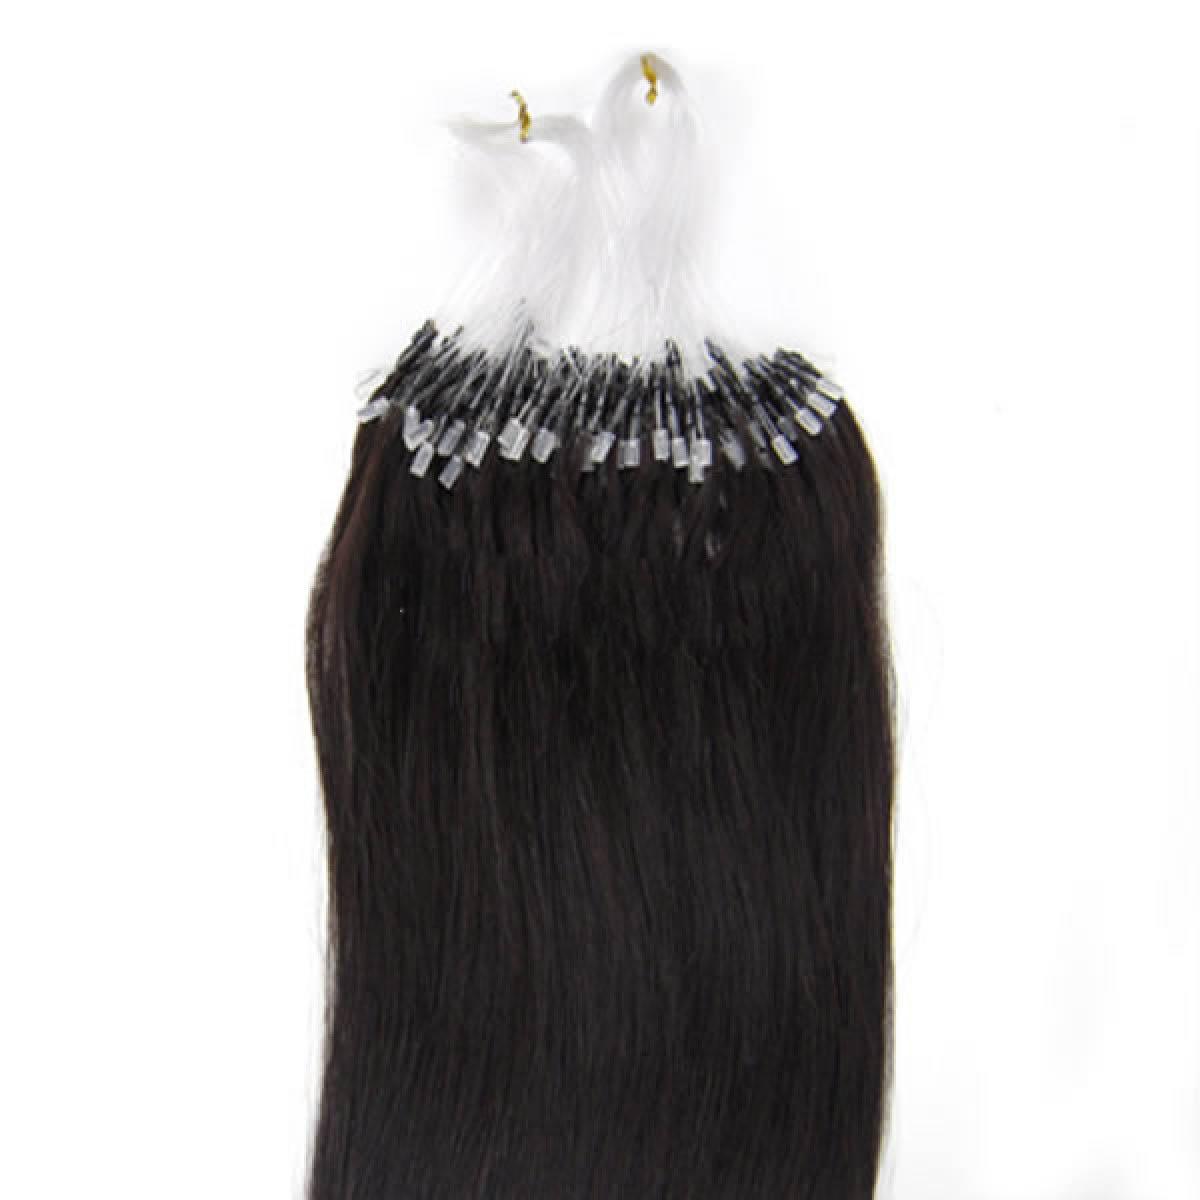 18 Inch 1b Natural Black Micro Loop Human Hair Extensions 100s 100g